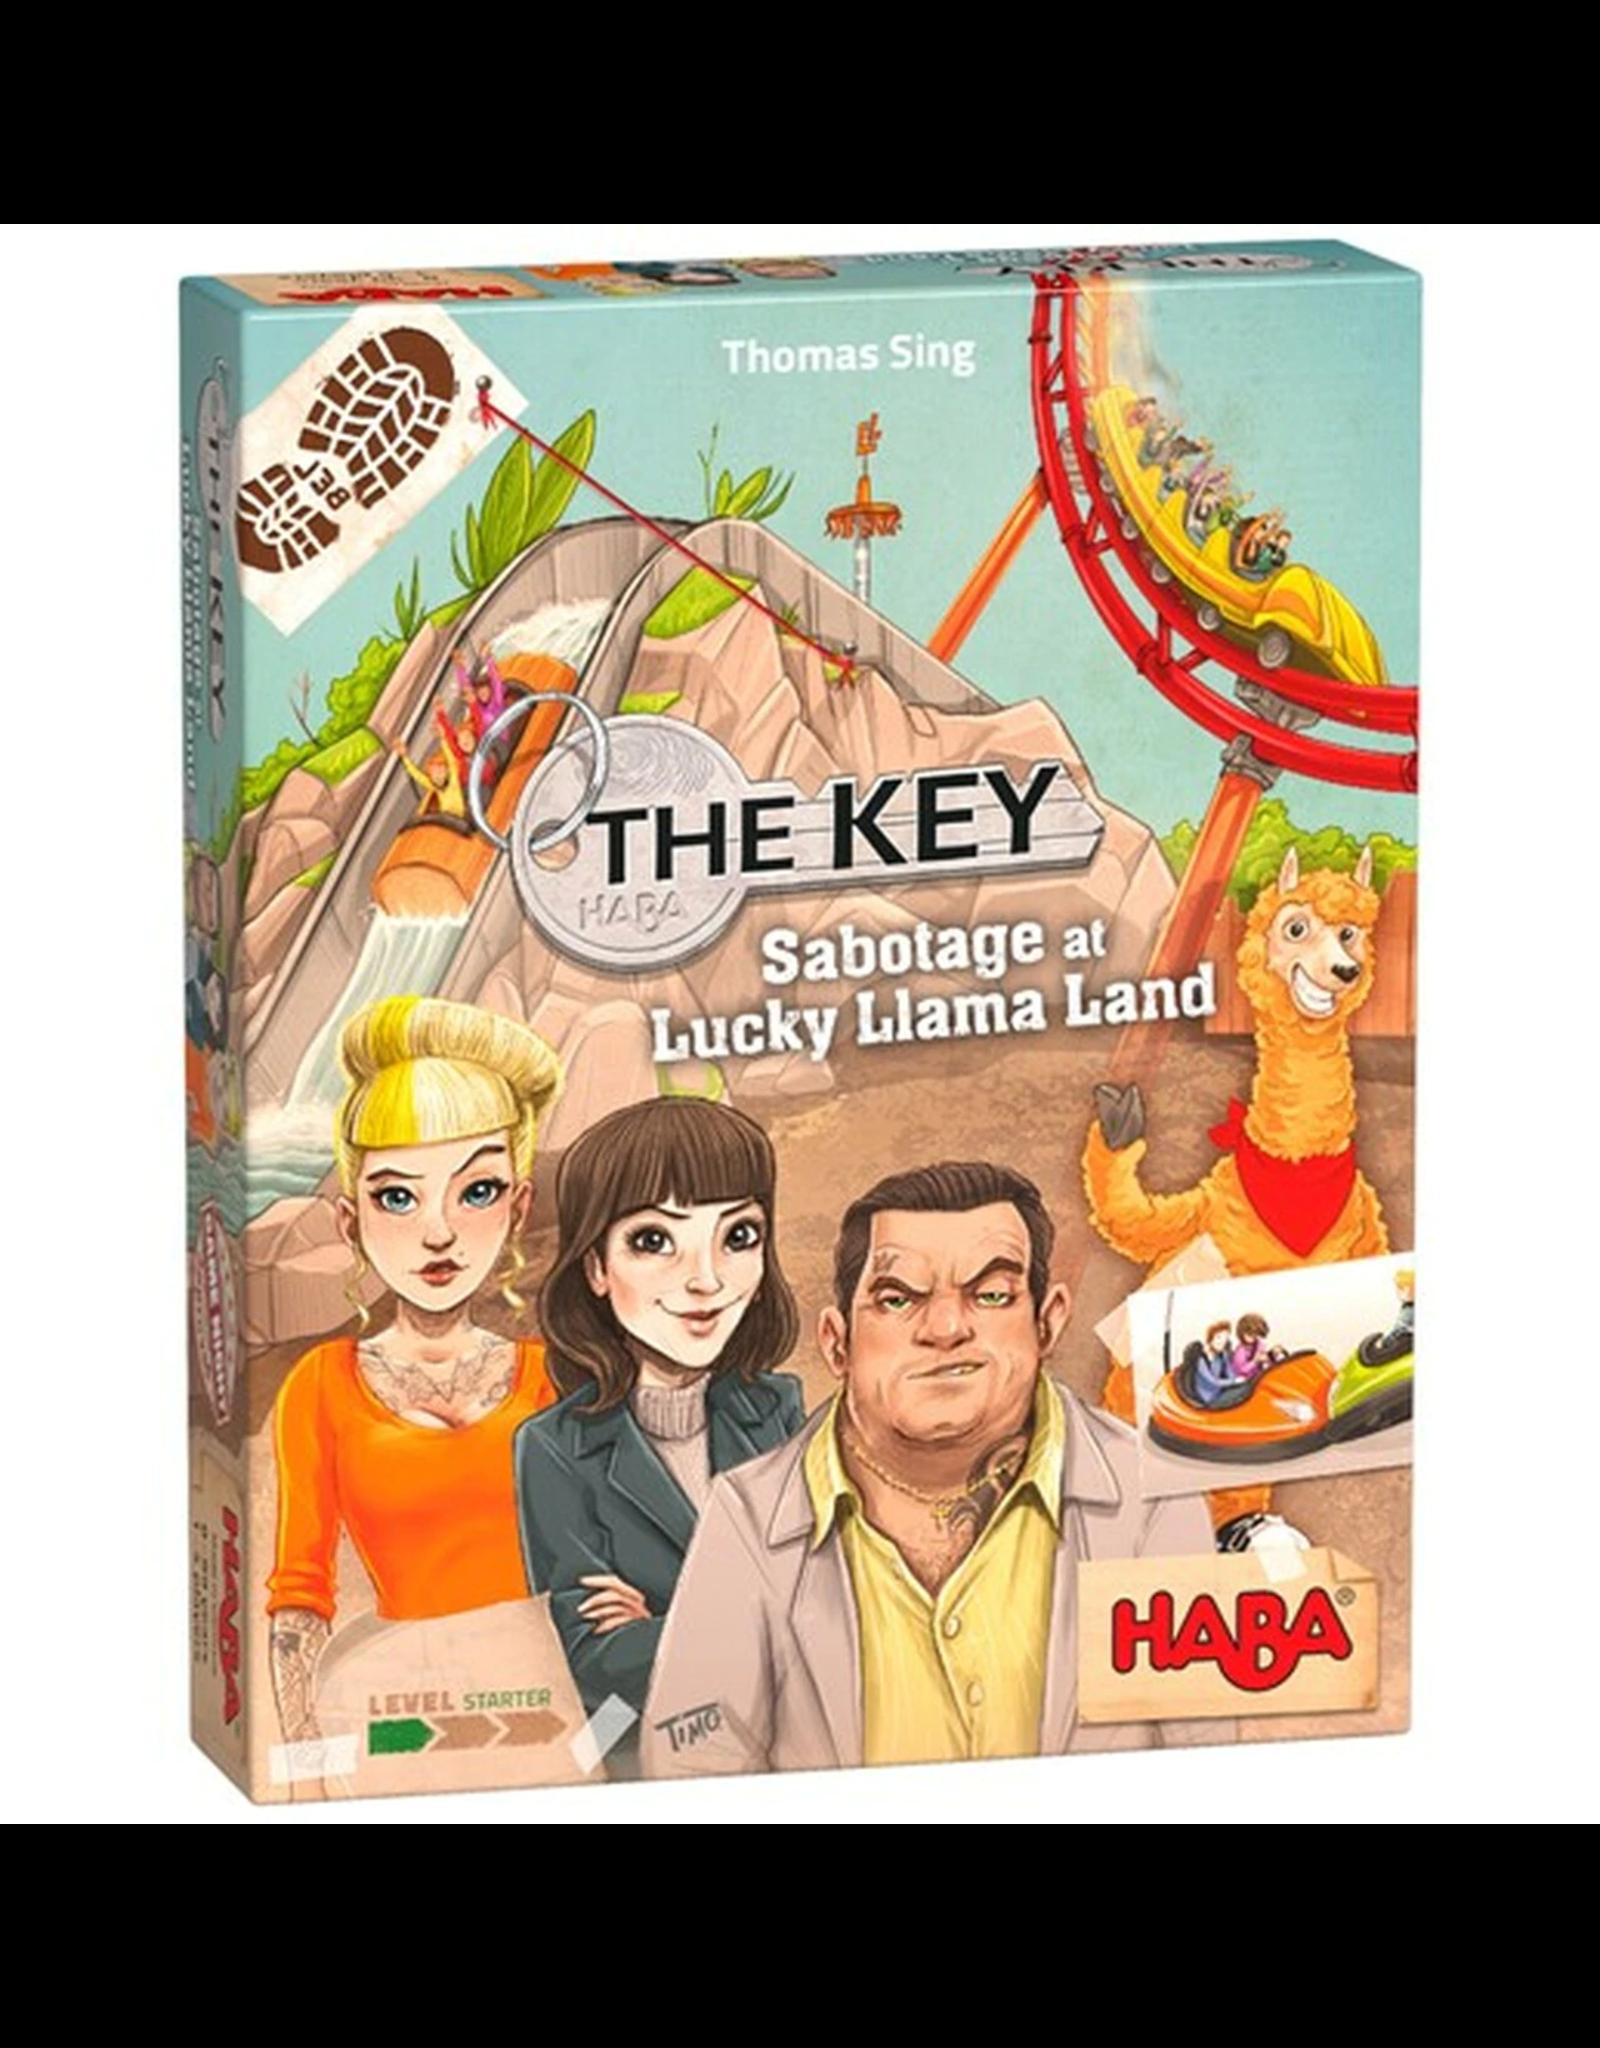 Haba The Key: Sabotage at Lucky Llama Land